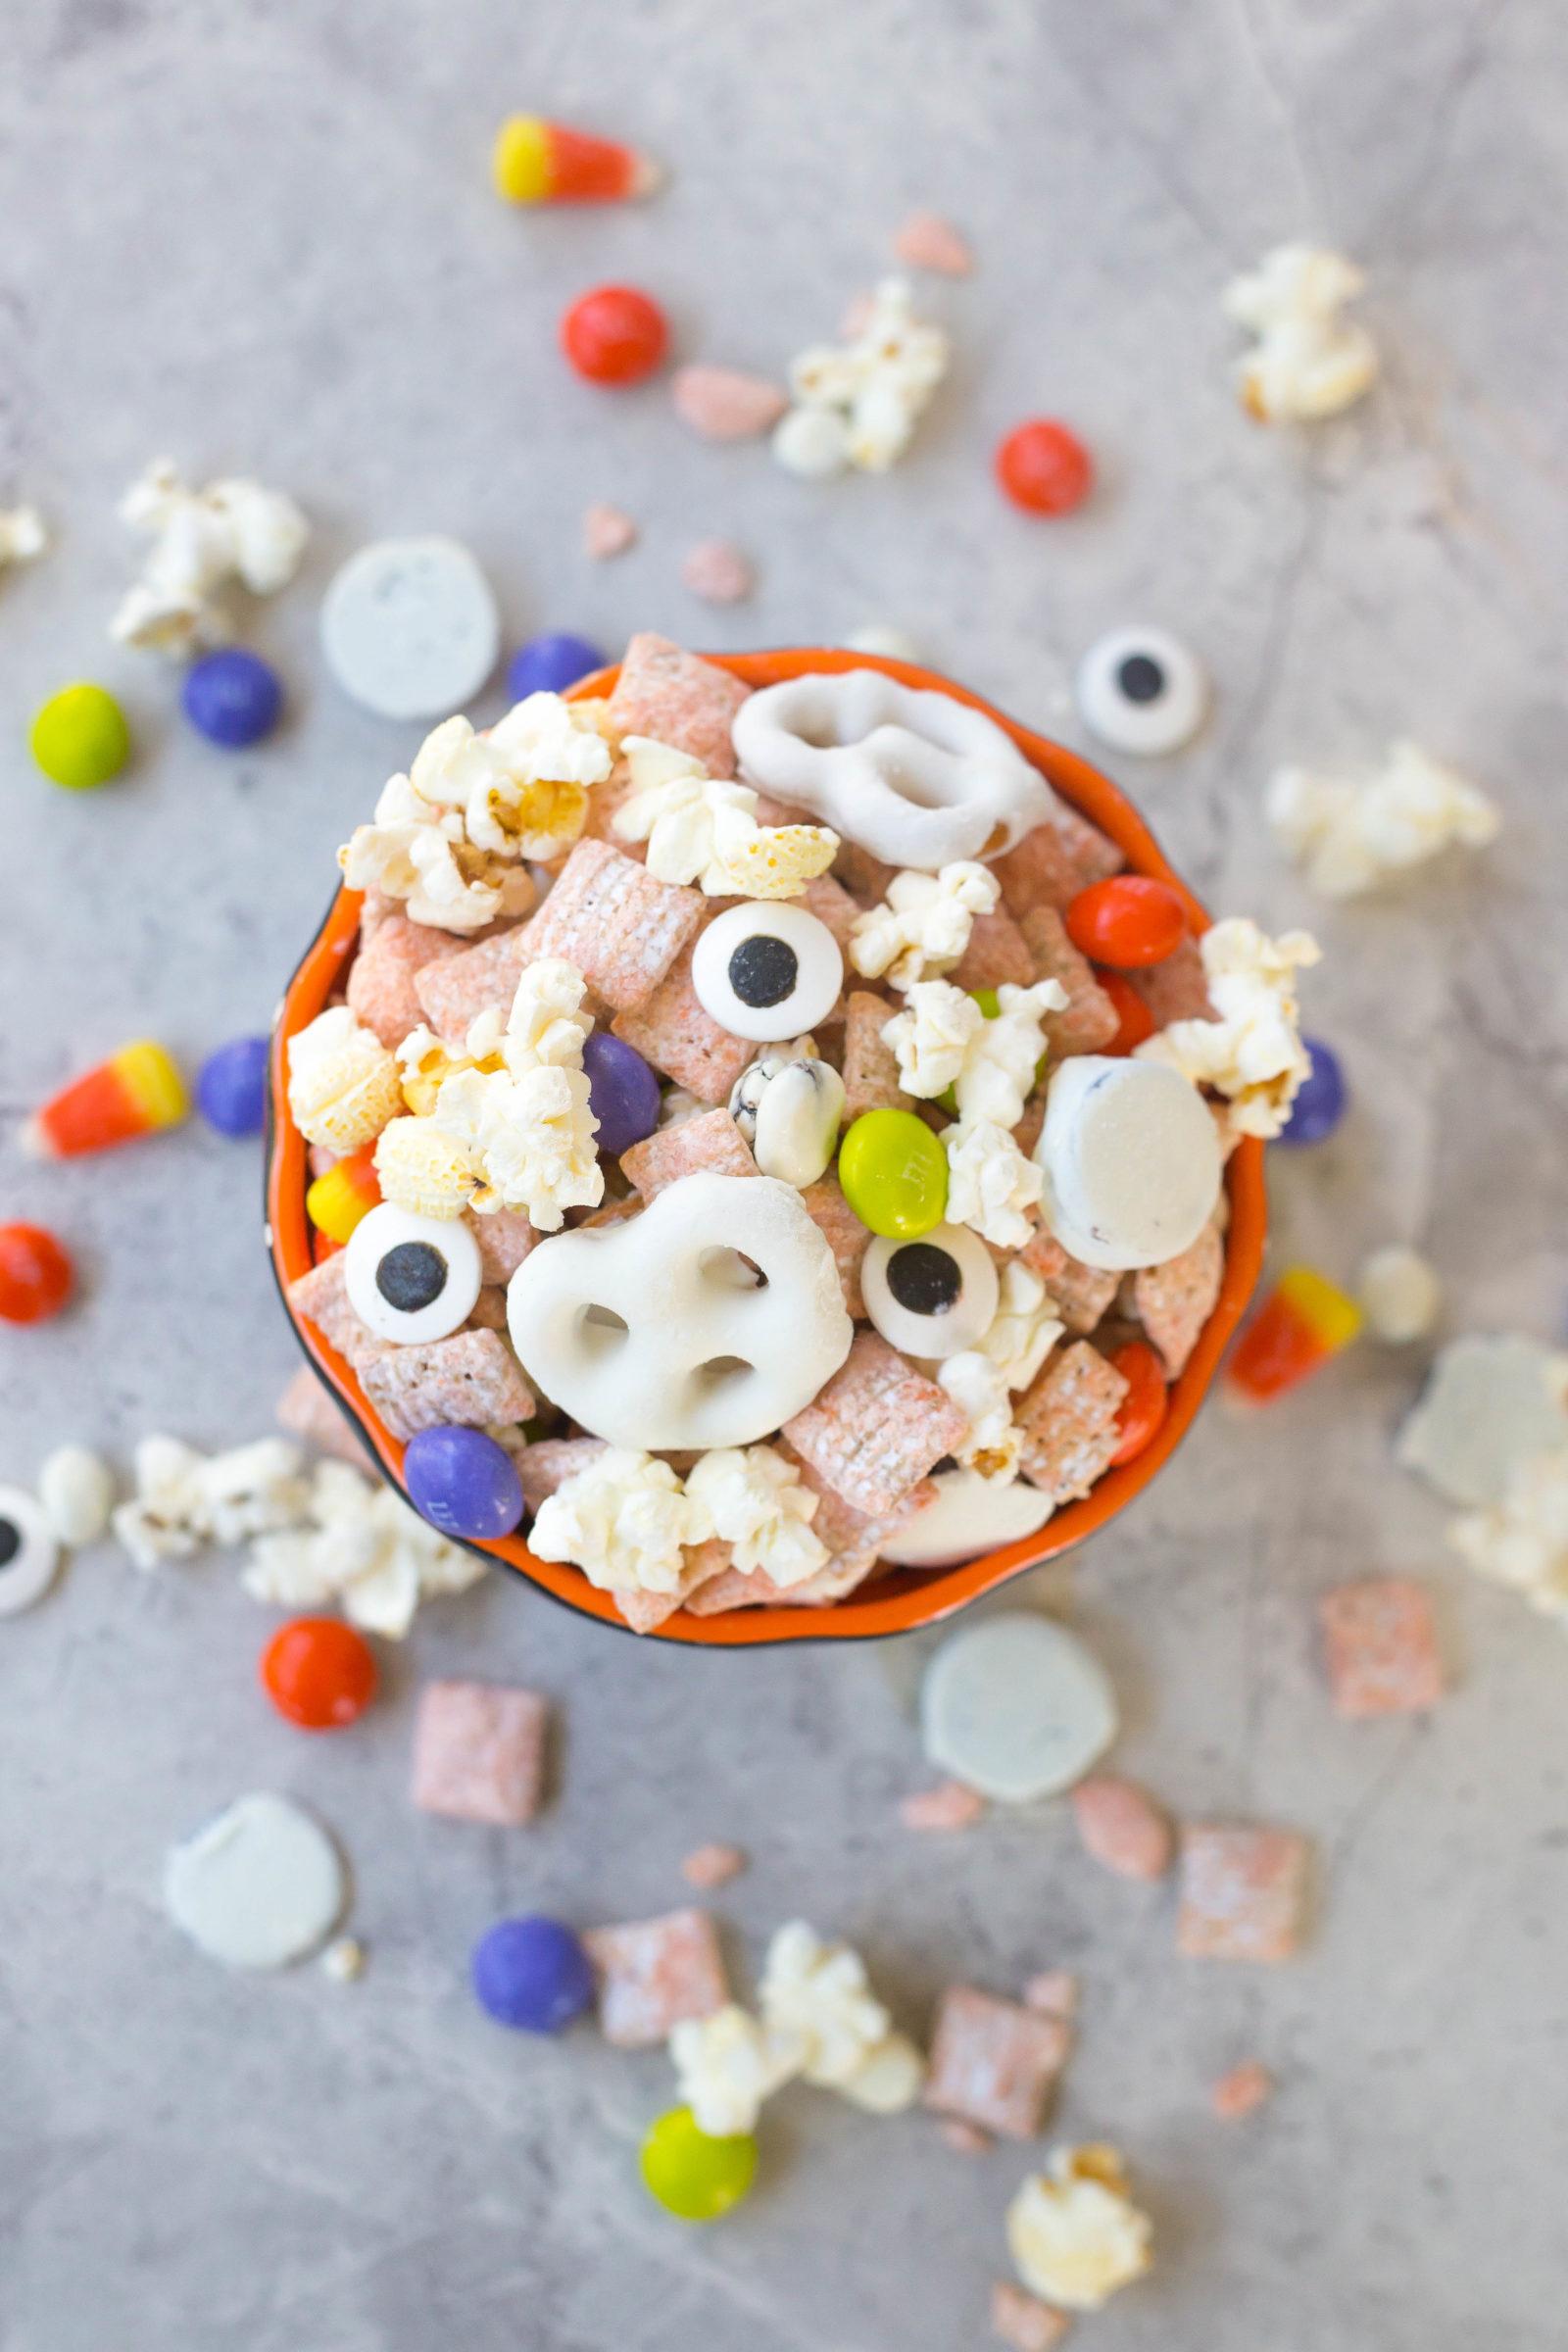 Overhead flat lay shot of popcorn mix with white pretzels and orange muddy buddies